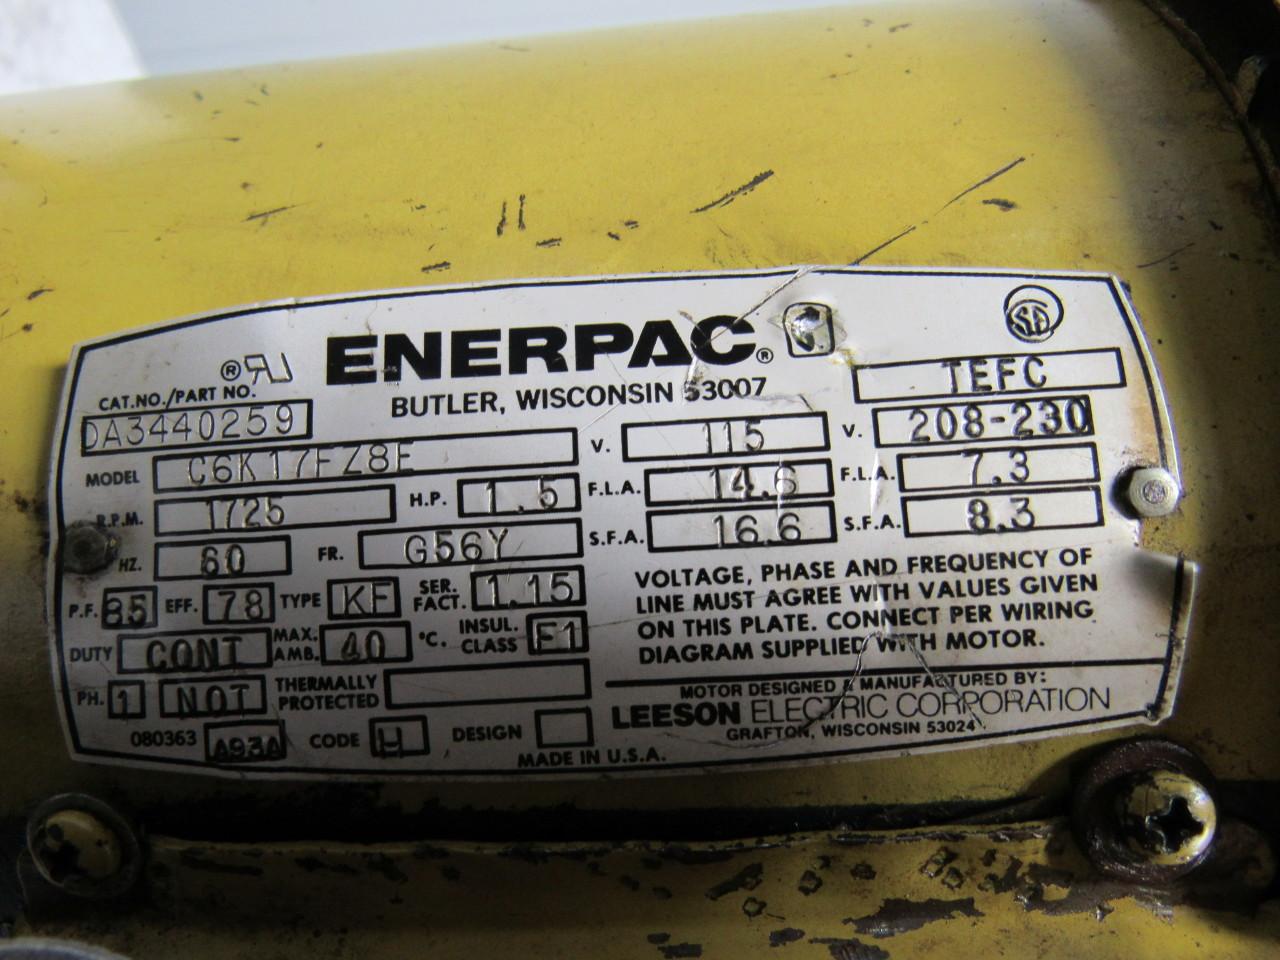 enerpac pem3602b 30000 submerged 10 000psi max electric hydraulic electric hydraulic pump 1phase · enerpac pem3602b 30000 submerged 10 000psi max electric hydraulic pump 1phase